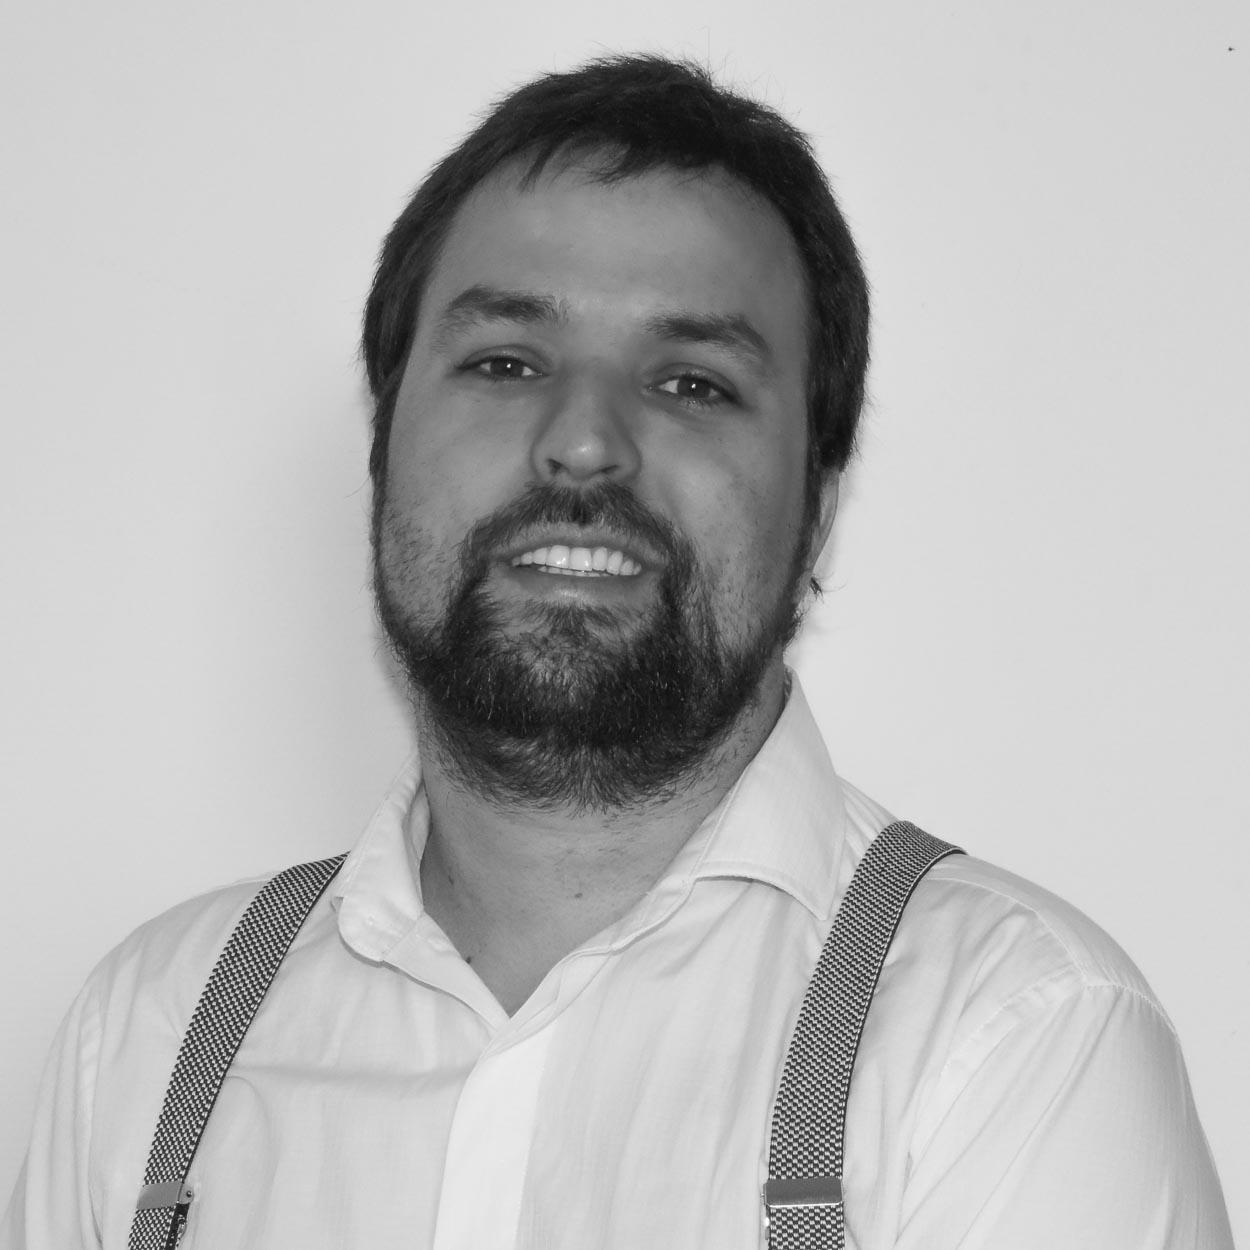 PhD CandidateBruno  Perez